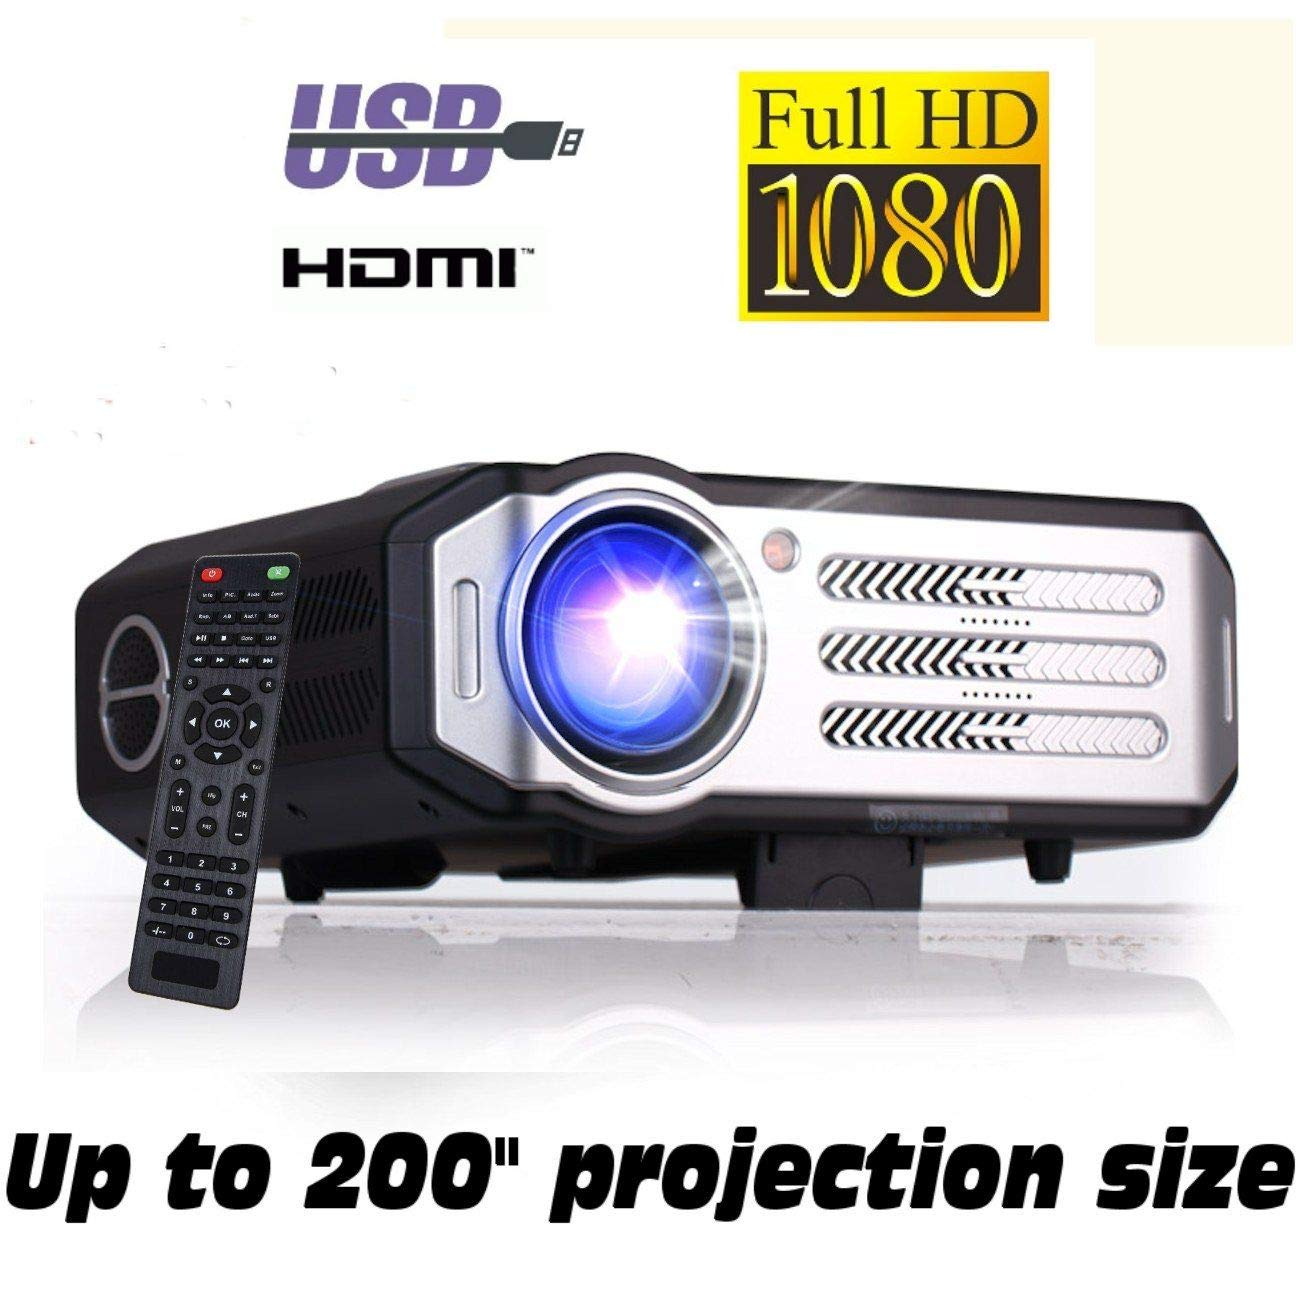 Proyector Full HD 1080P, XSAGON(2018 Nuevo modelo)Proyectores 2200LMS (3500 LED) Lúmenes Portátil Proyectores LED, LCD 1920x1080, 2 HDMI, VGA, 2 USB, ...